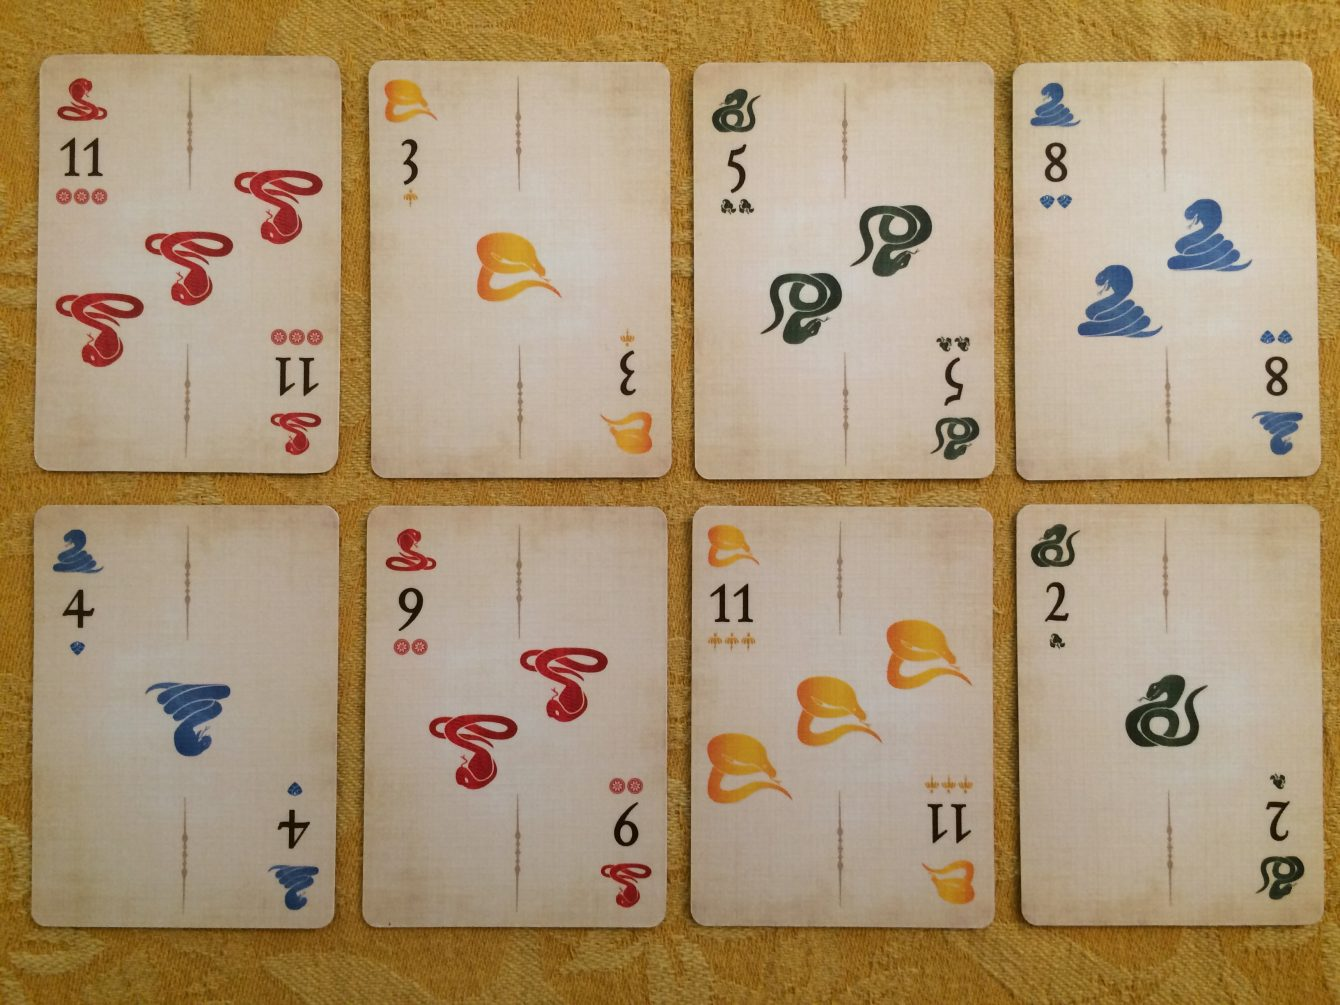 cobras-by-cardboard-edison-cards